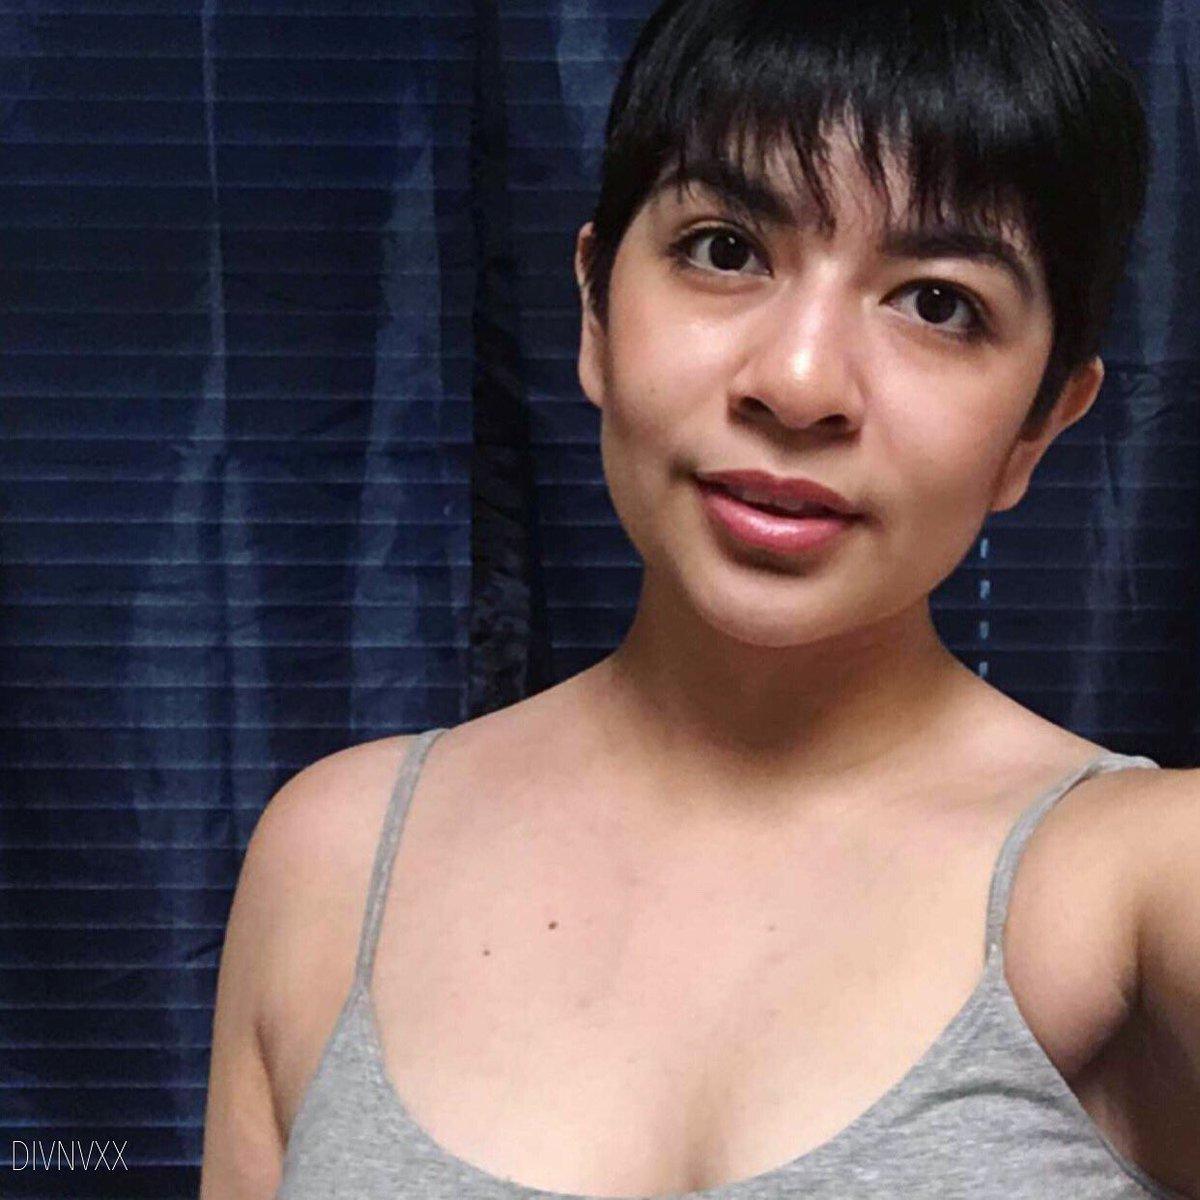 Diana La Xicana on Twitter: